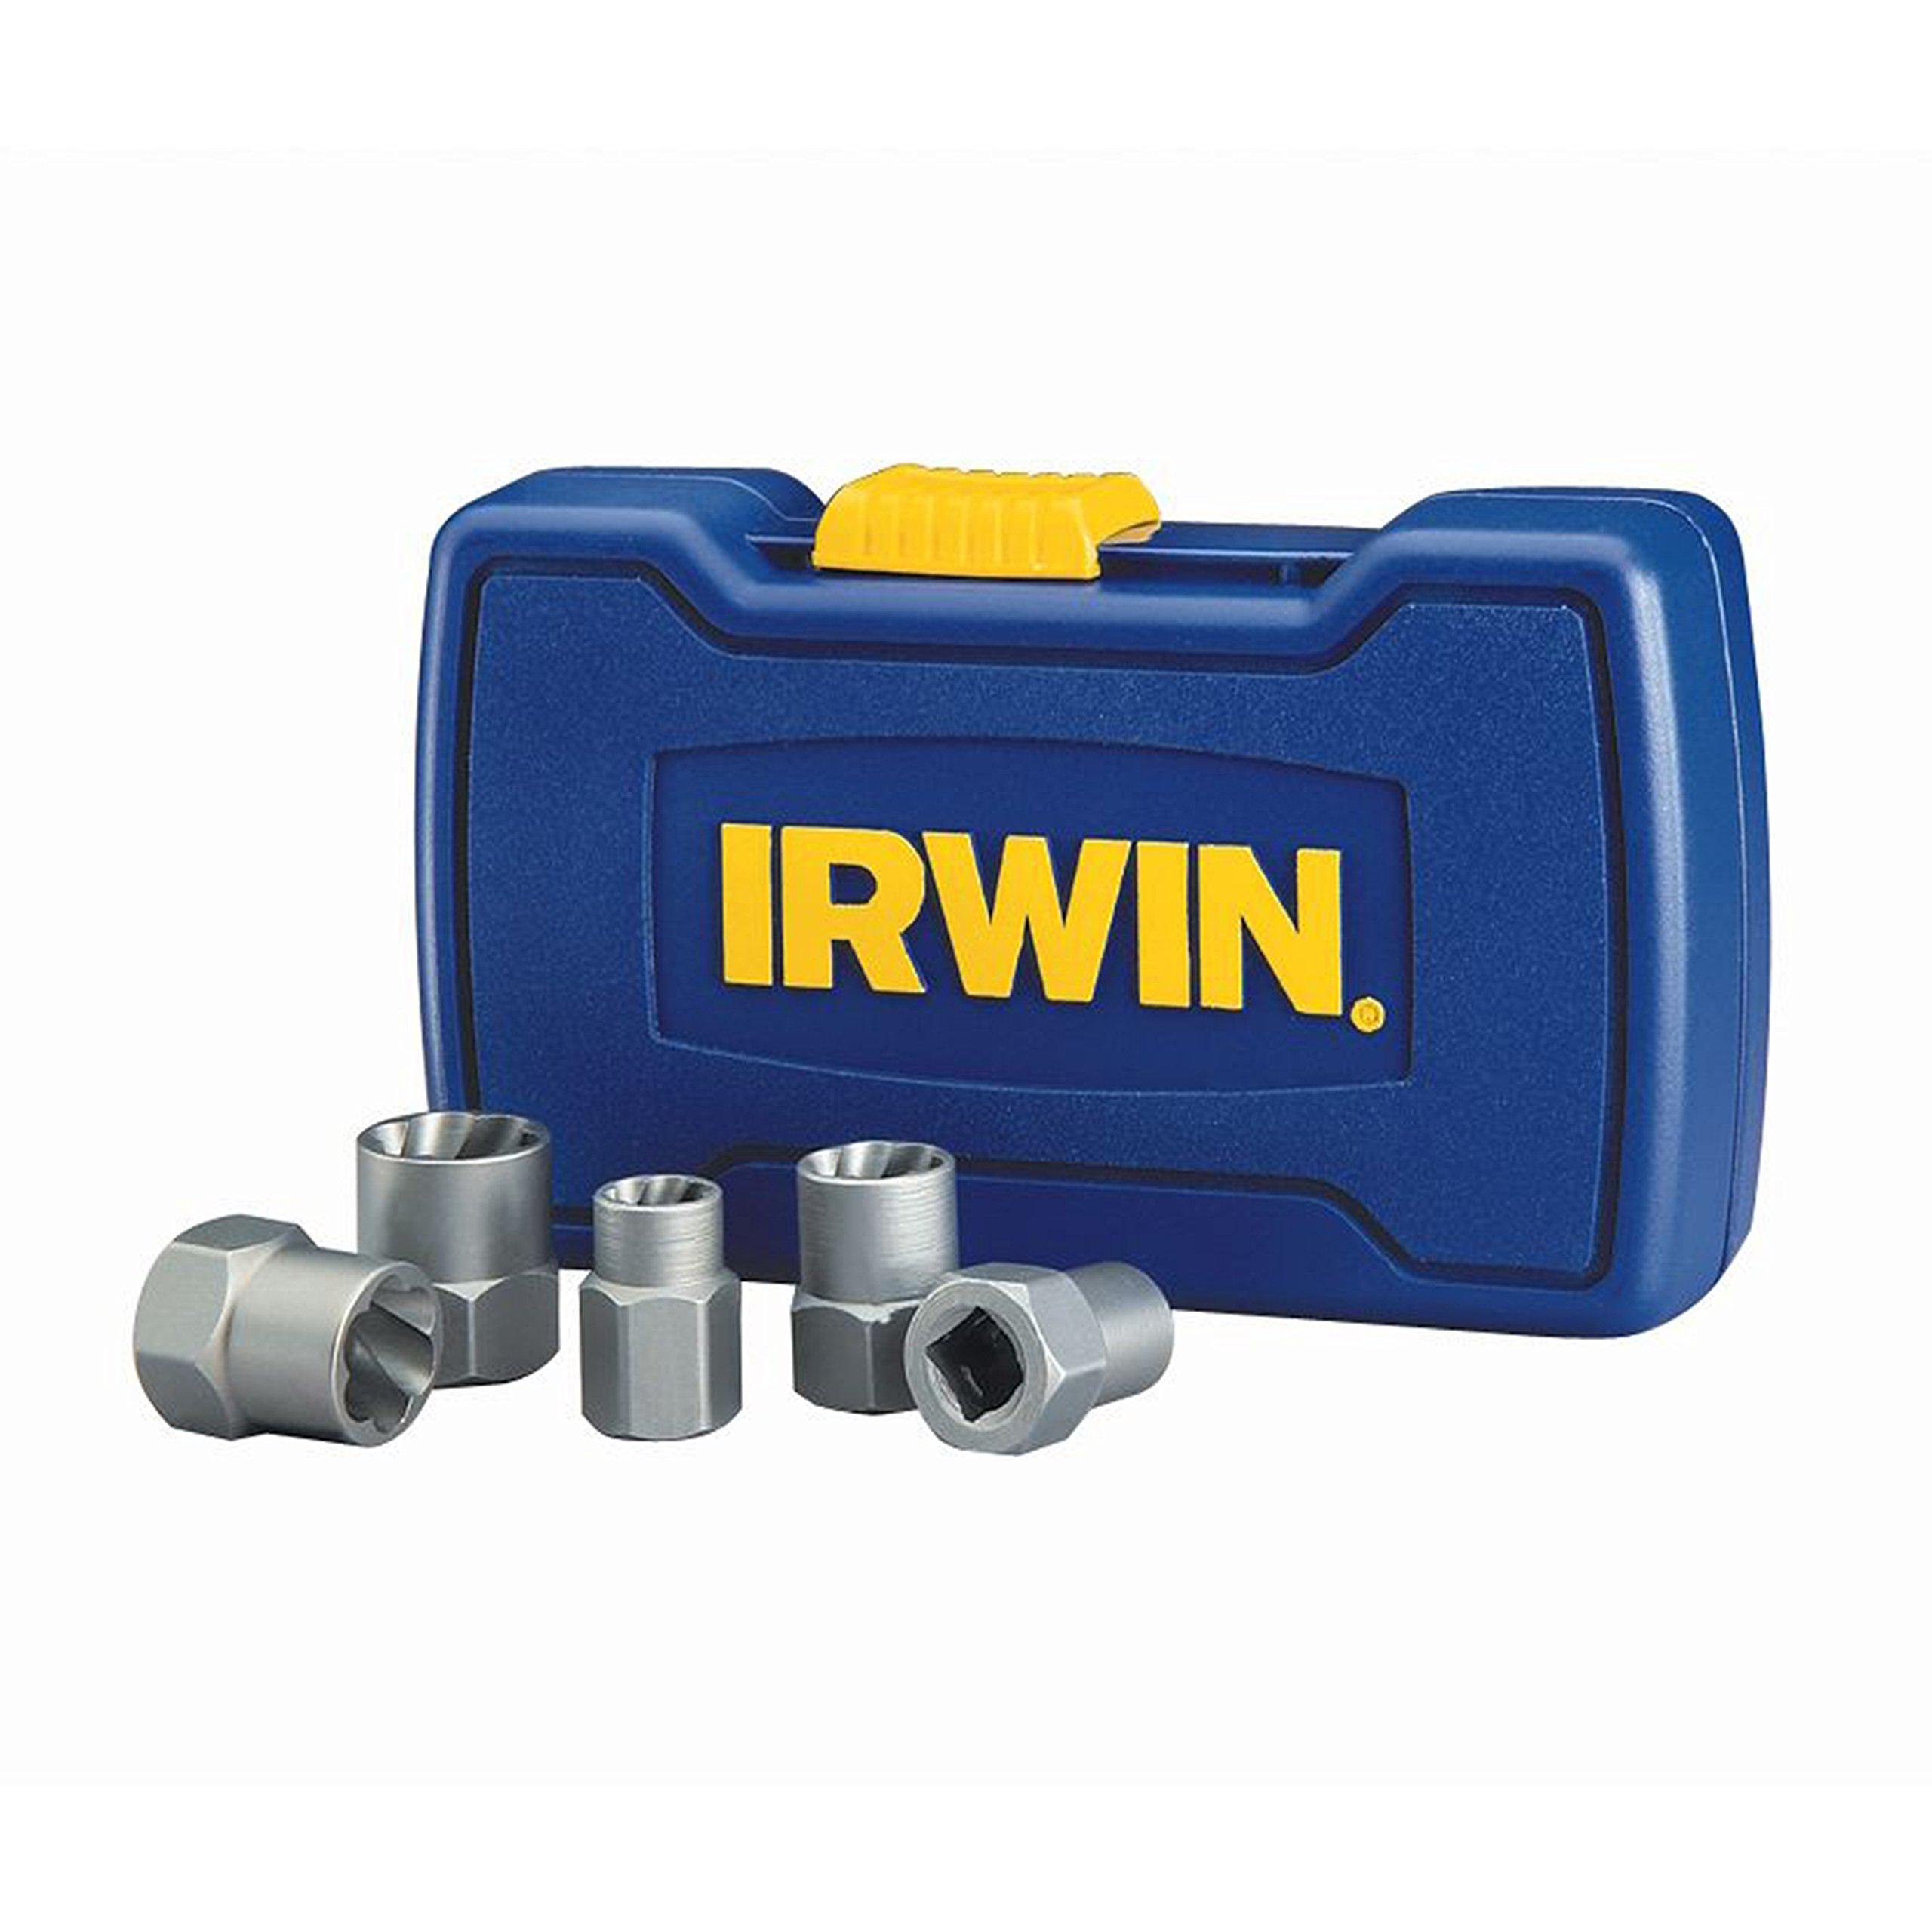 IRWIN HANSON BOLT-GRIP Bolt Extractor Base Set, 5 Piece, 394001 by Irwin Tools